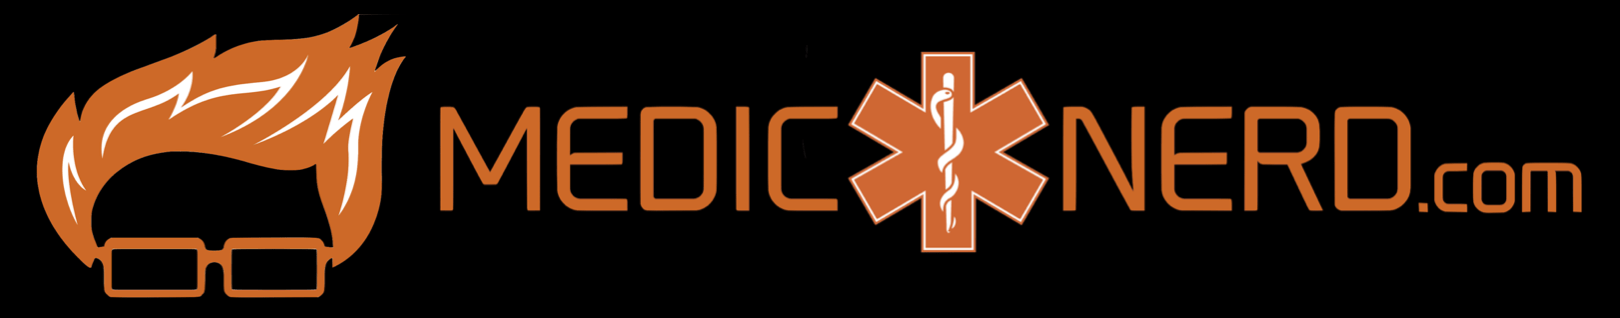 Critical Care Paramedic Review Flashcards Medicnerd